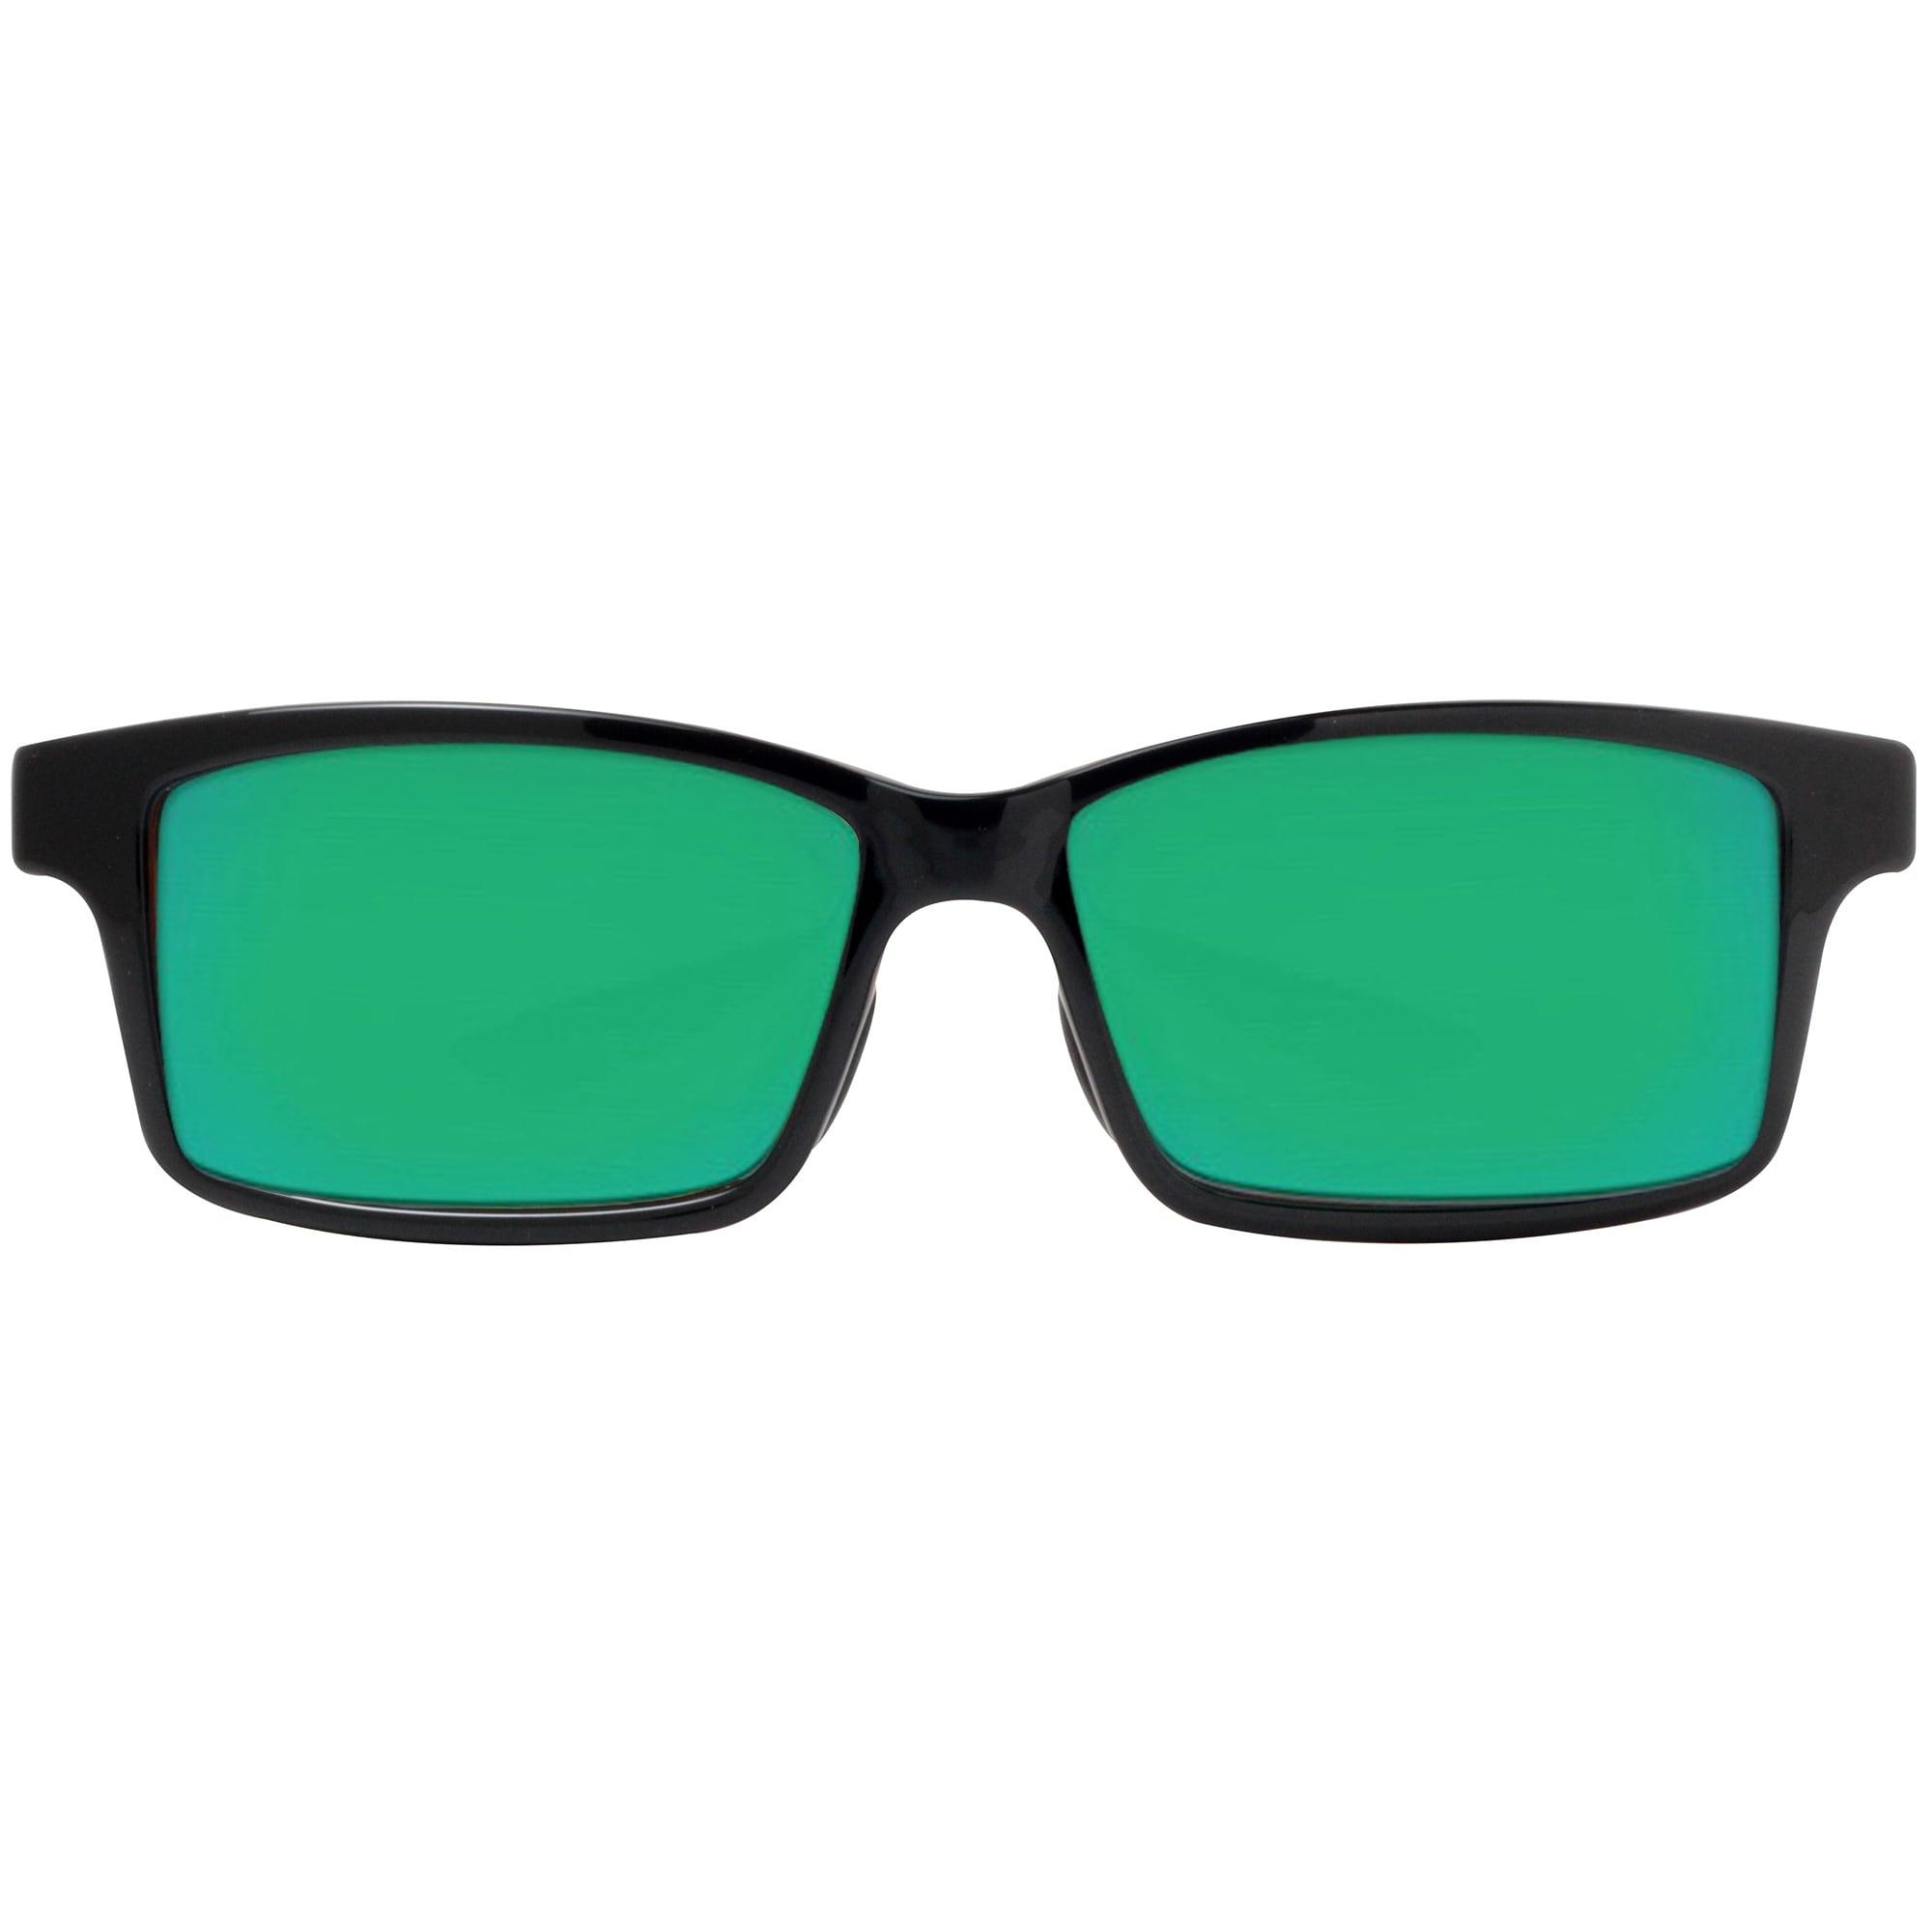 395812c0c4532 Shop Costa del Mar Tern TE80 OGMP Black Amber Green Mirror 580P Sunglasses  - 54mm-13mm-133mm - Free Shipping Today - Overstock - 21153975